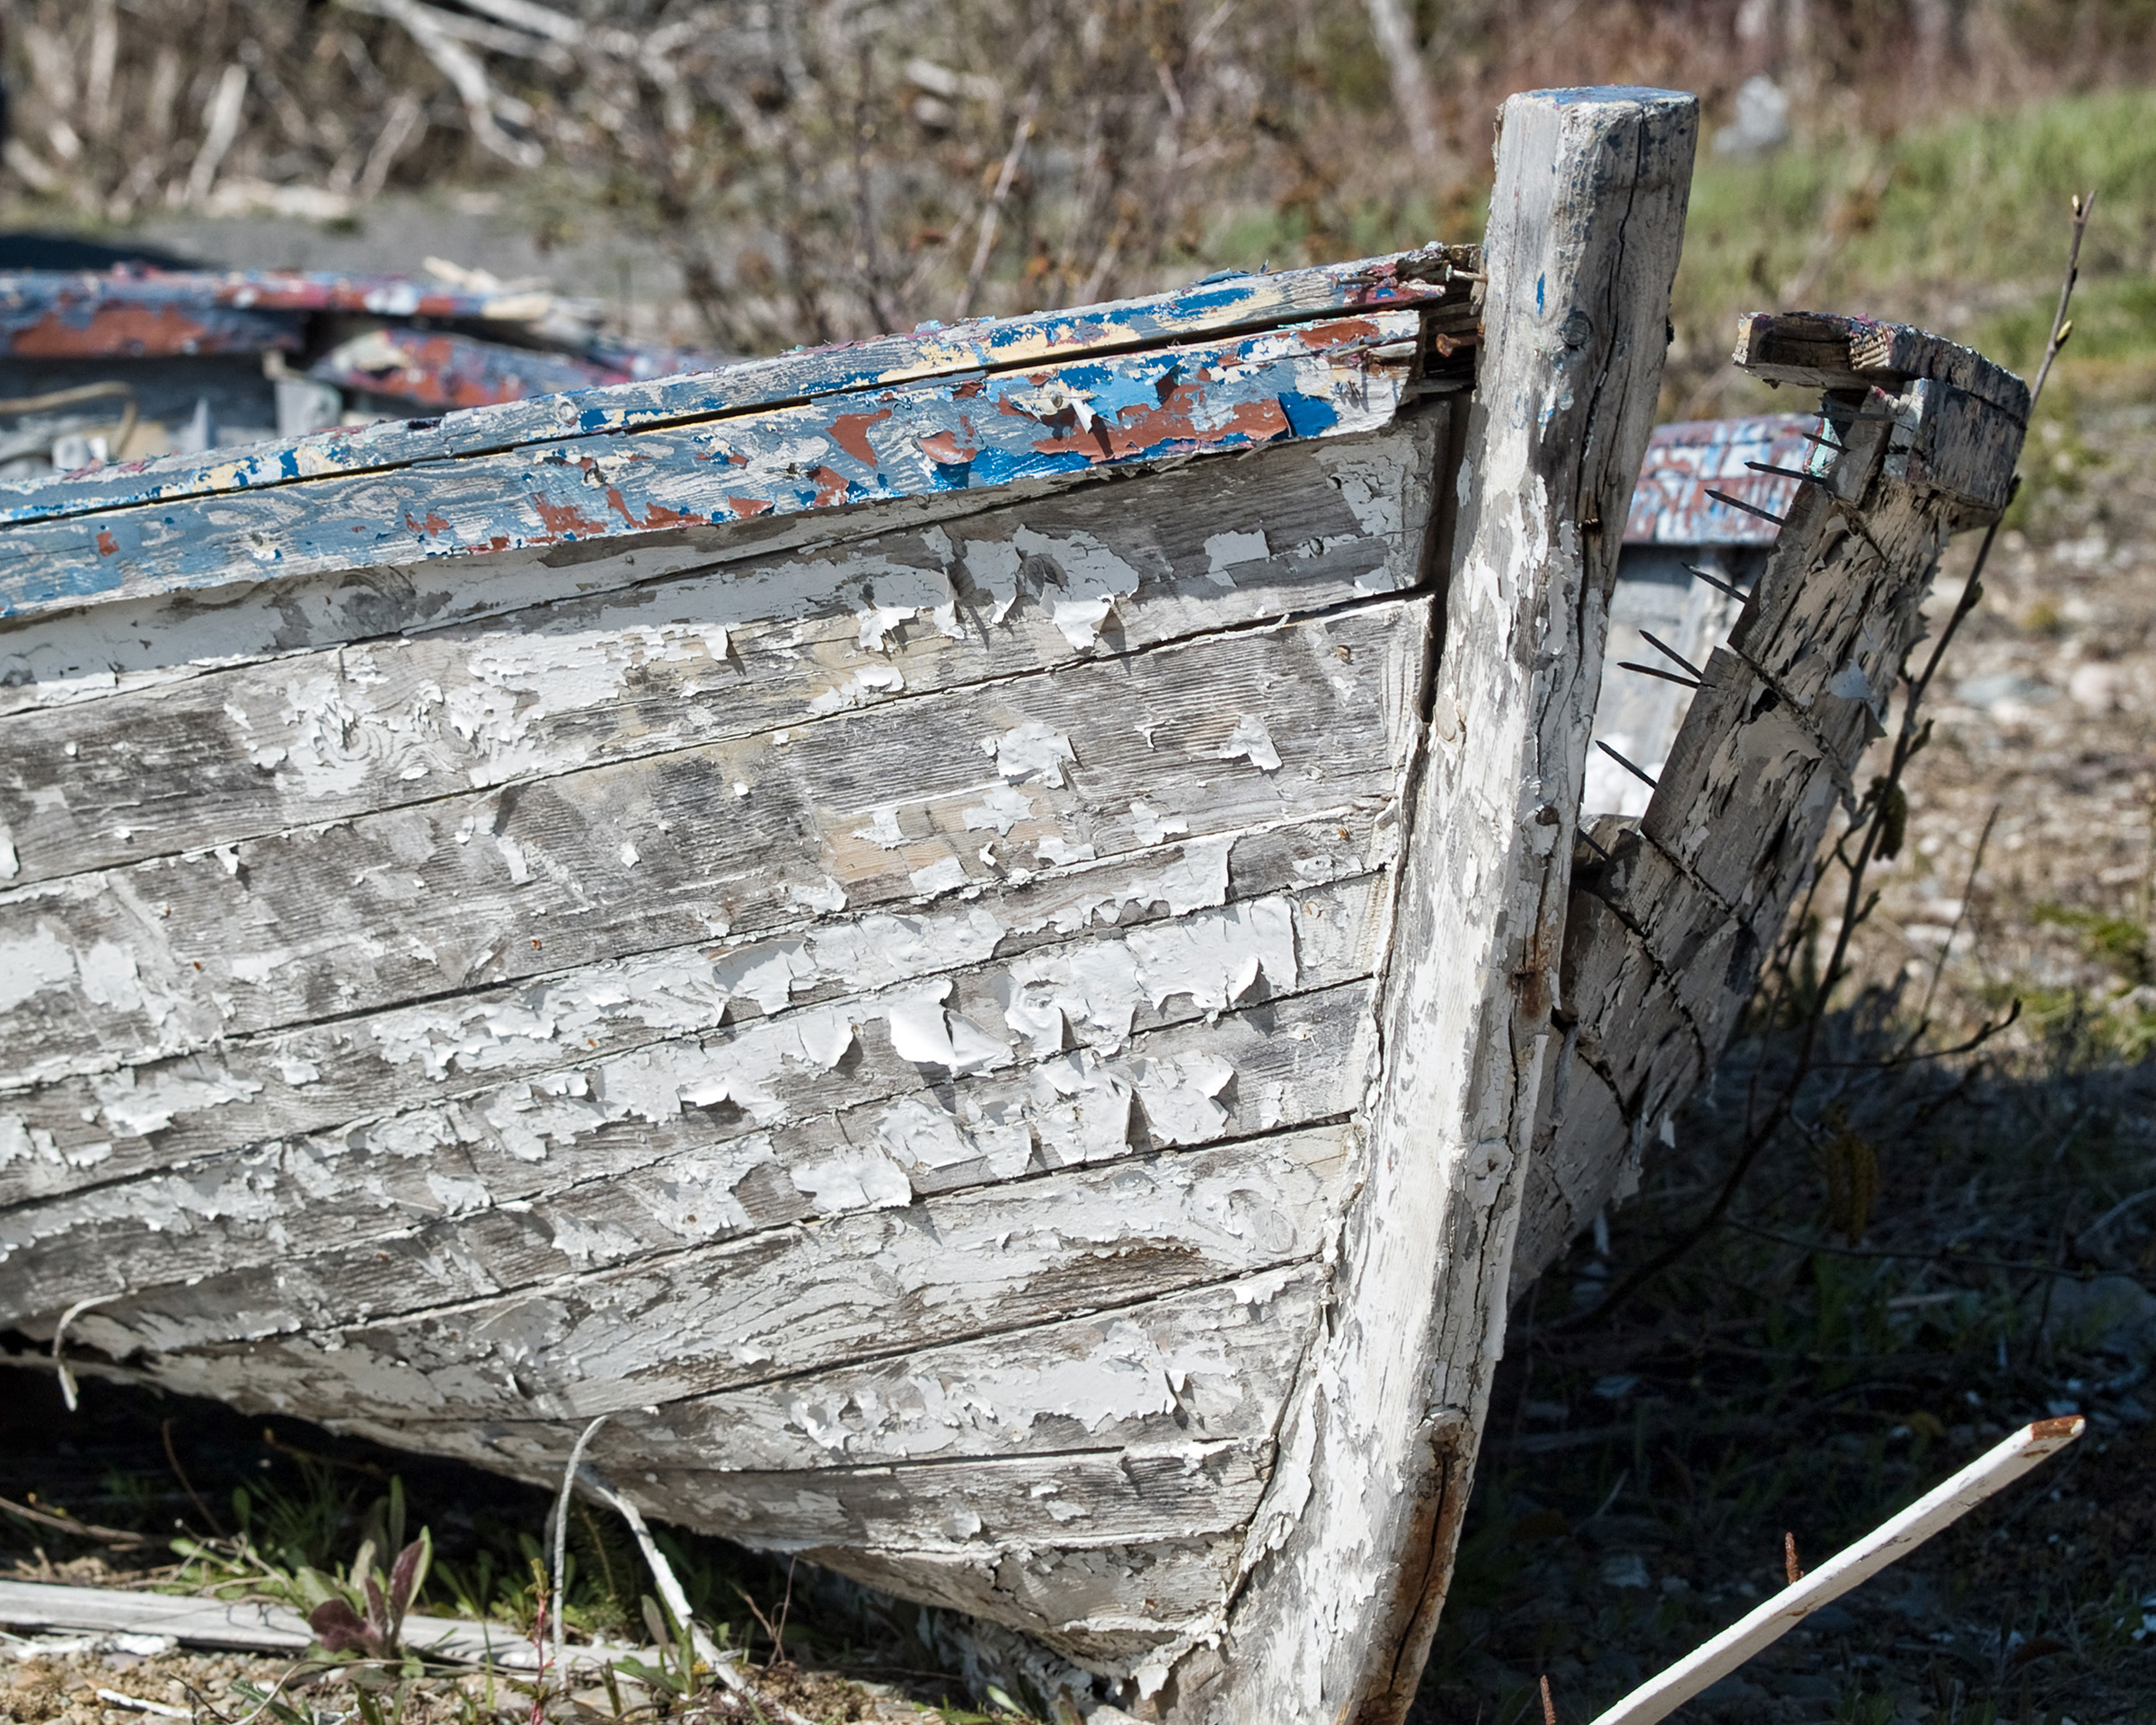 Boat, Abandoned, Travel, Sea, Seaside, HQ Photo